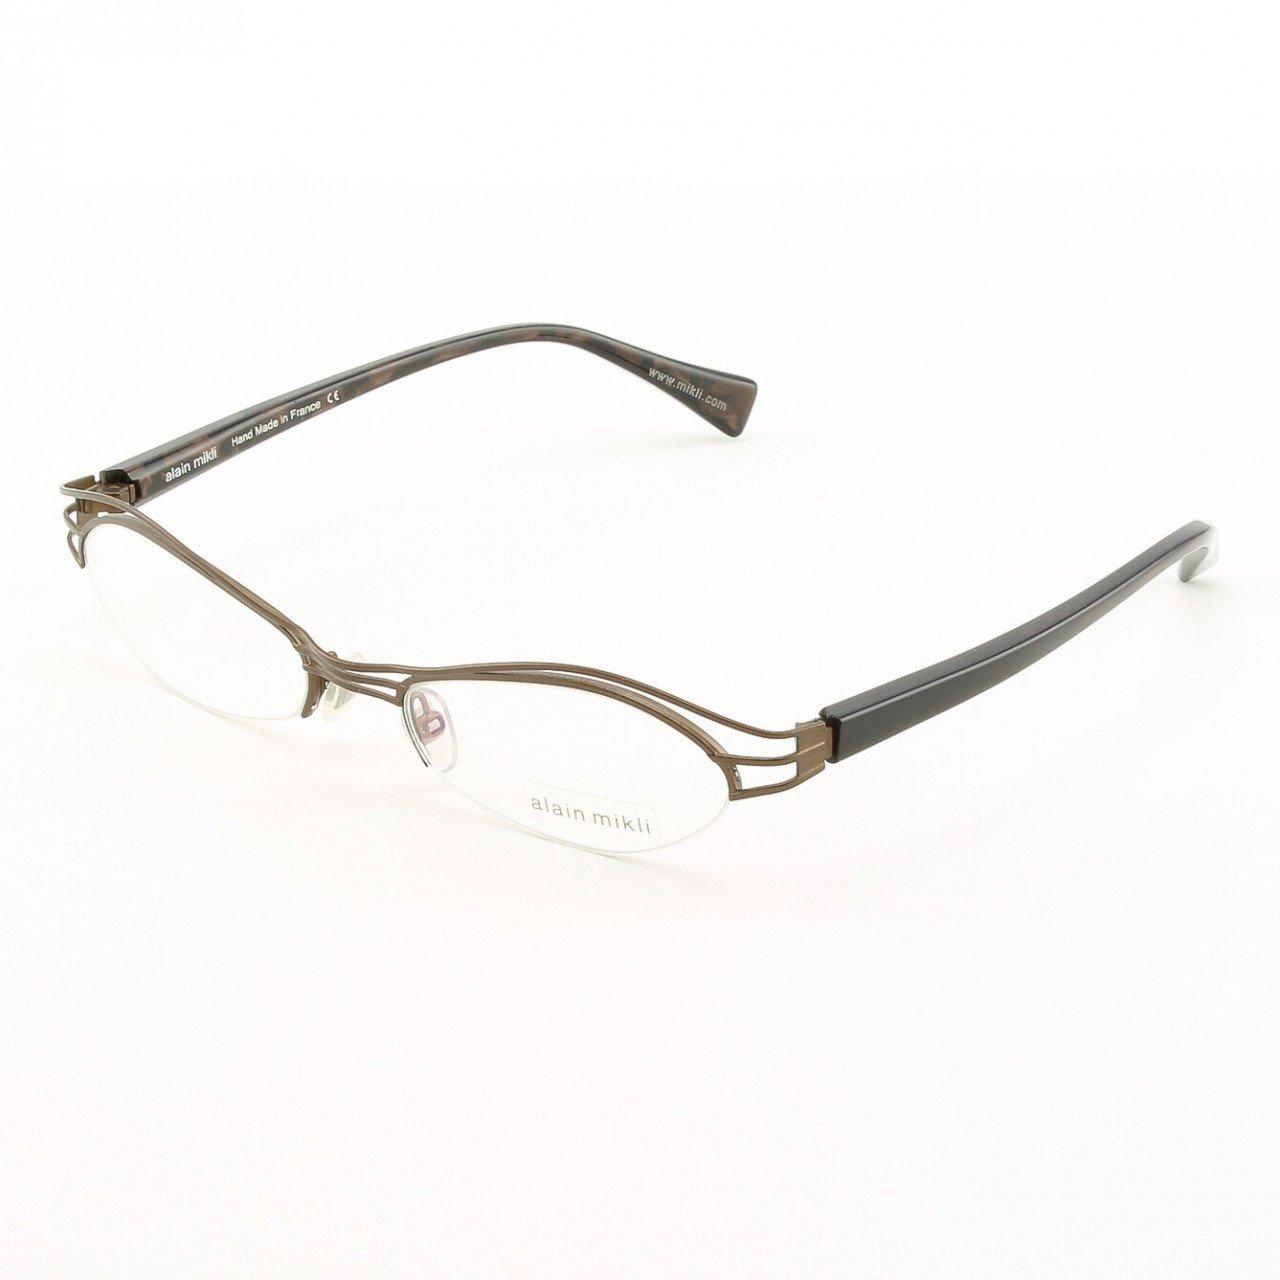 Alain Mikli Eyeglasses AL1110 Col. 2 Matte Copper with Deep Purple Pearlized Temples